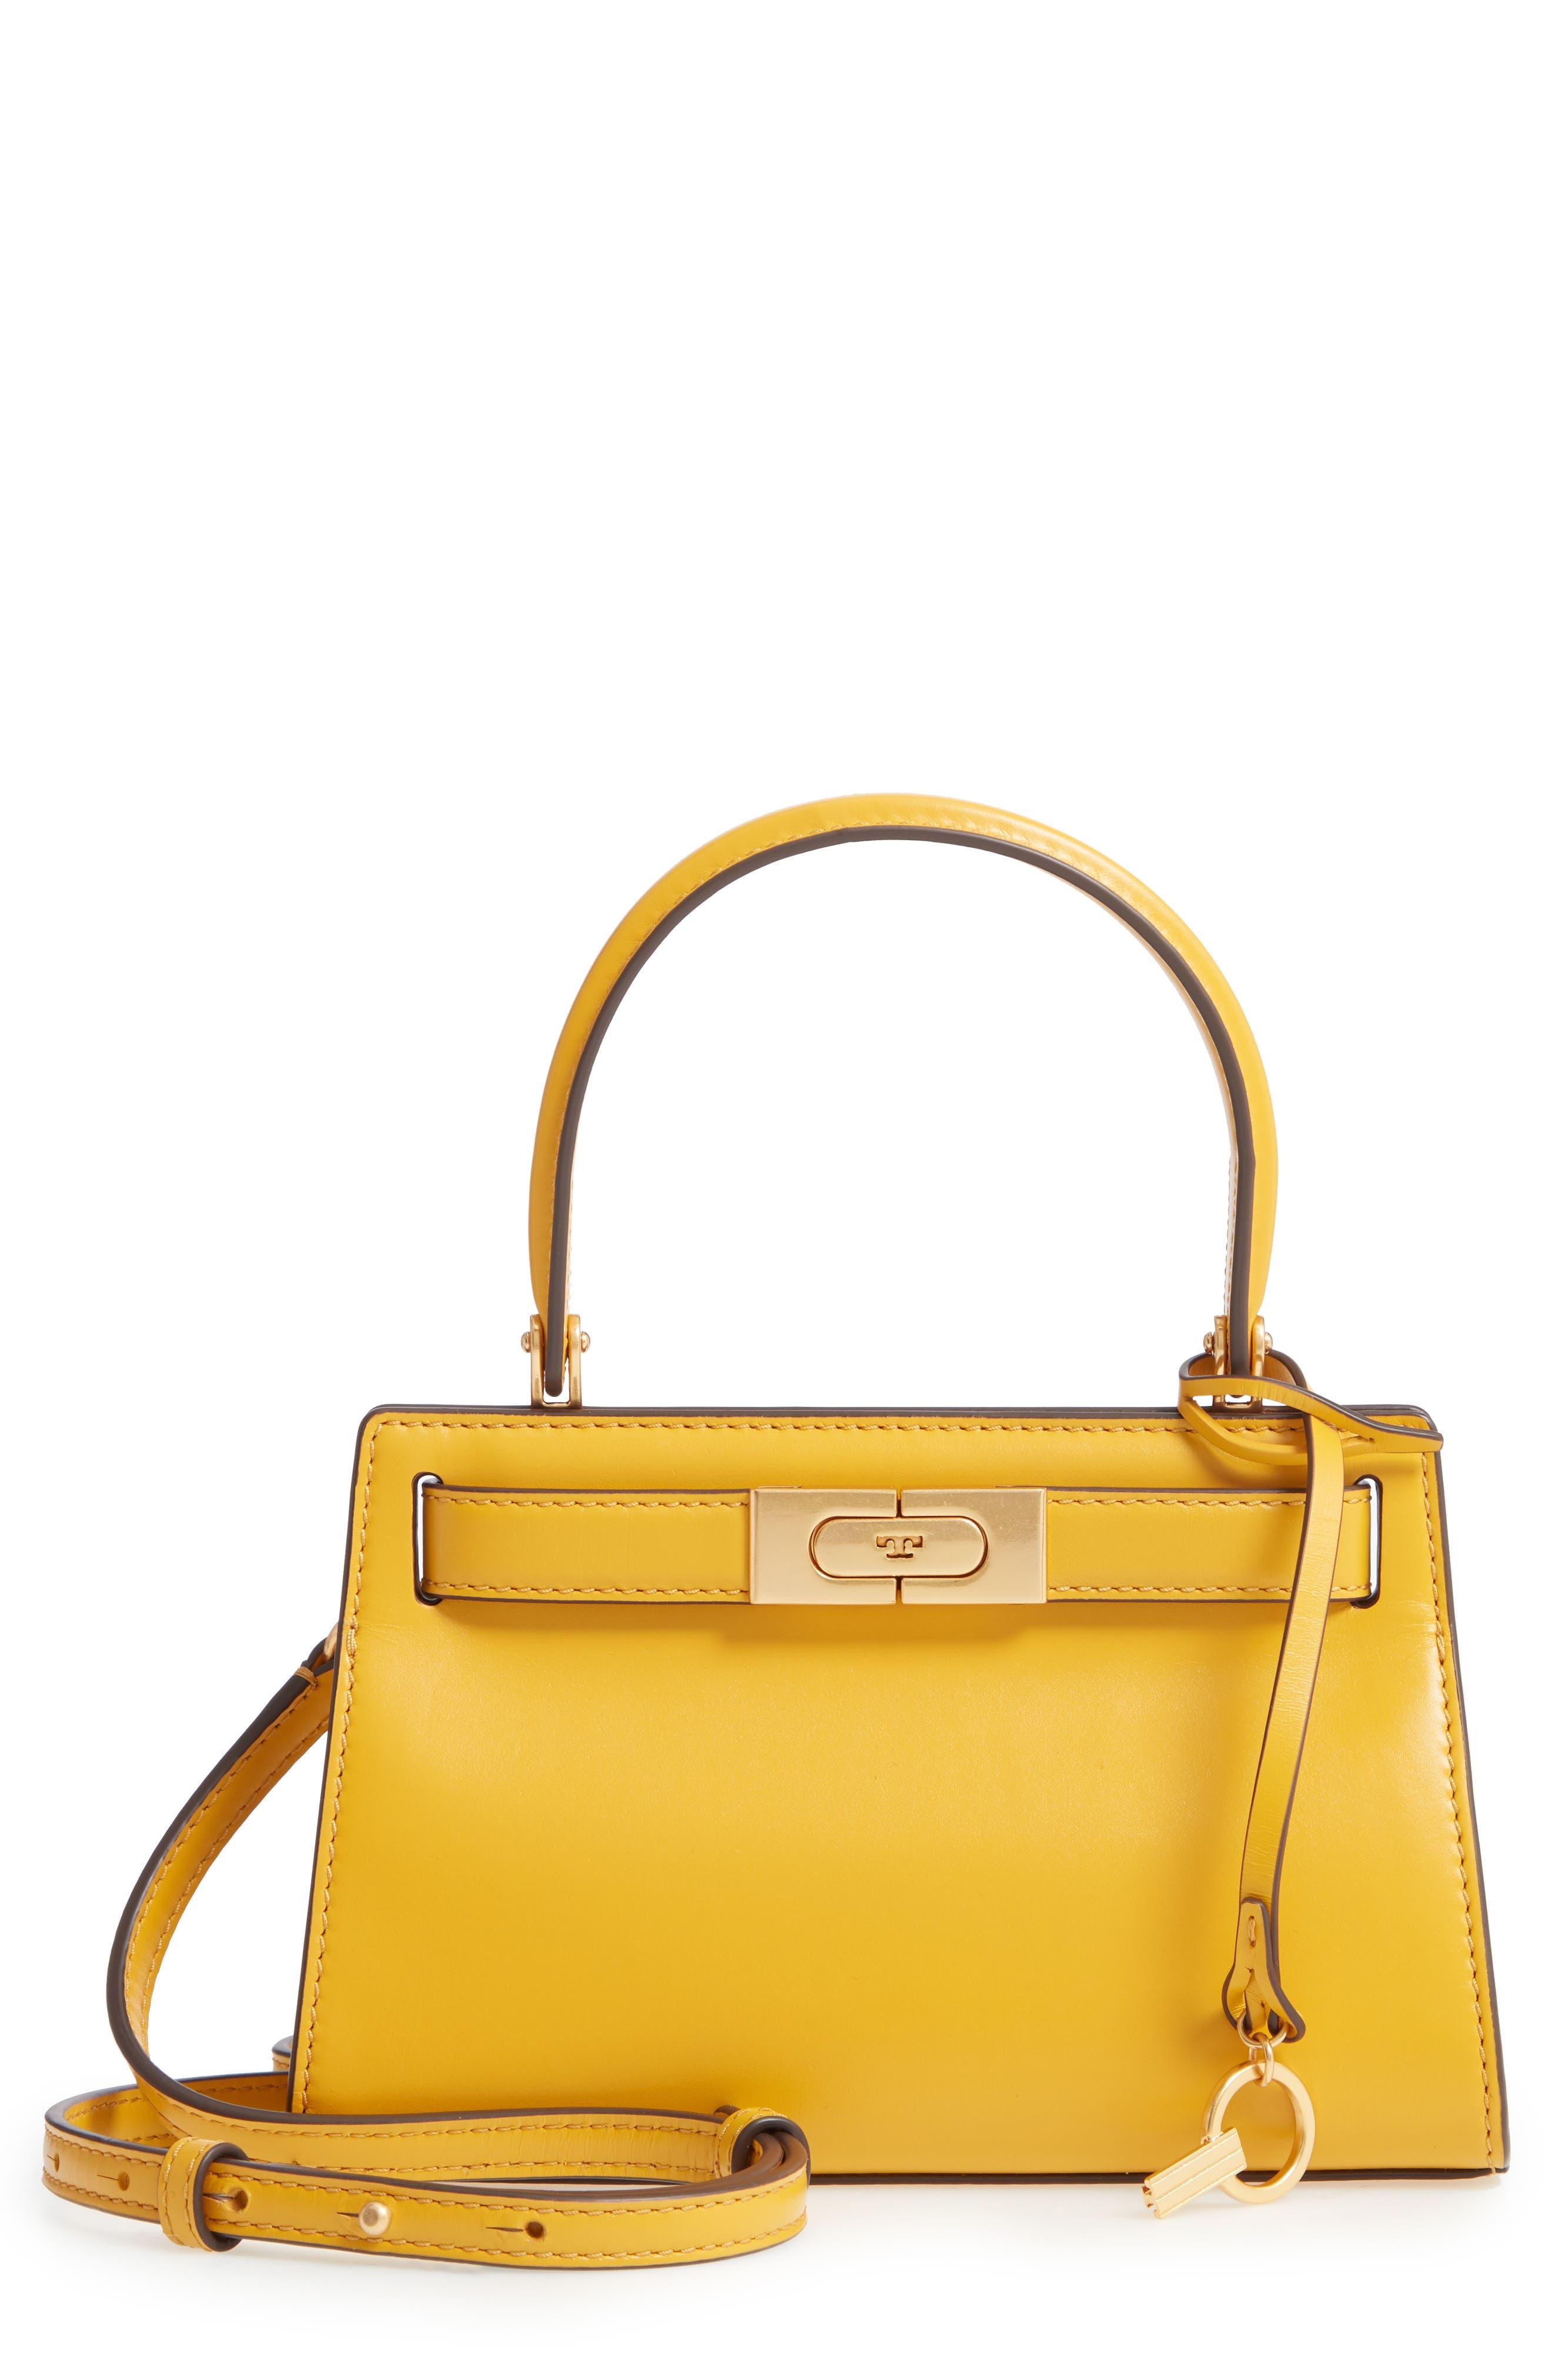 TORY BURCH Mini Lee Radziwill Leather Bag, Main, color, DAYLILY